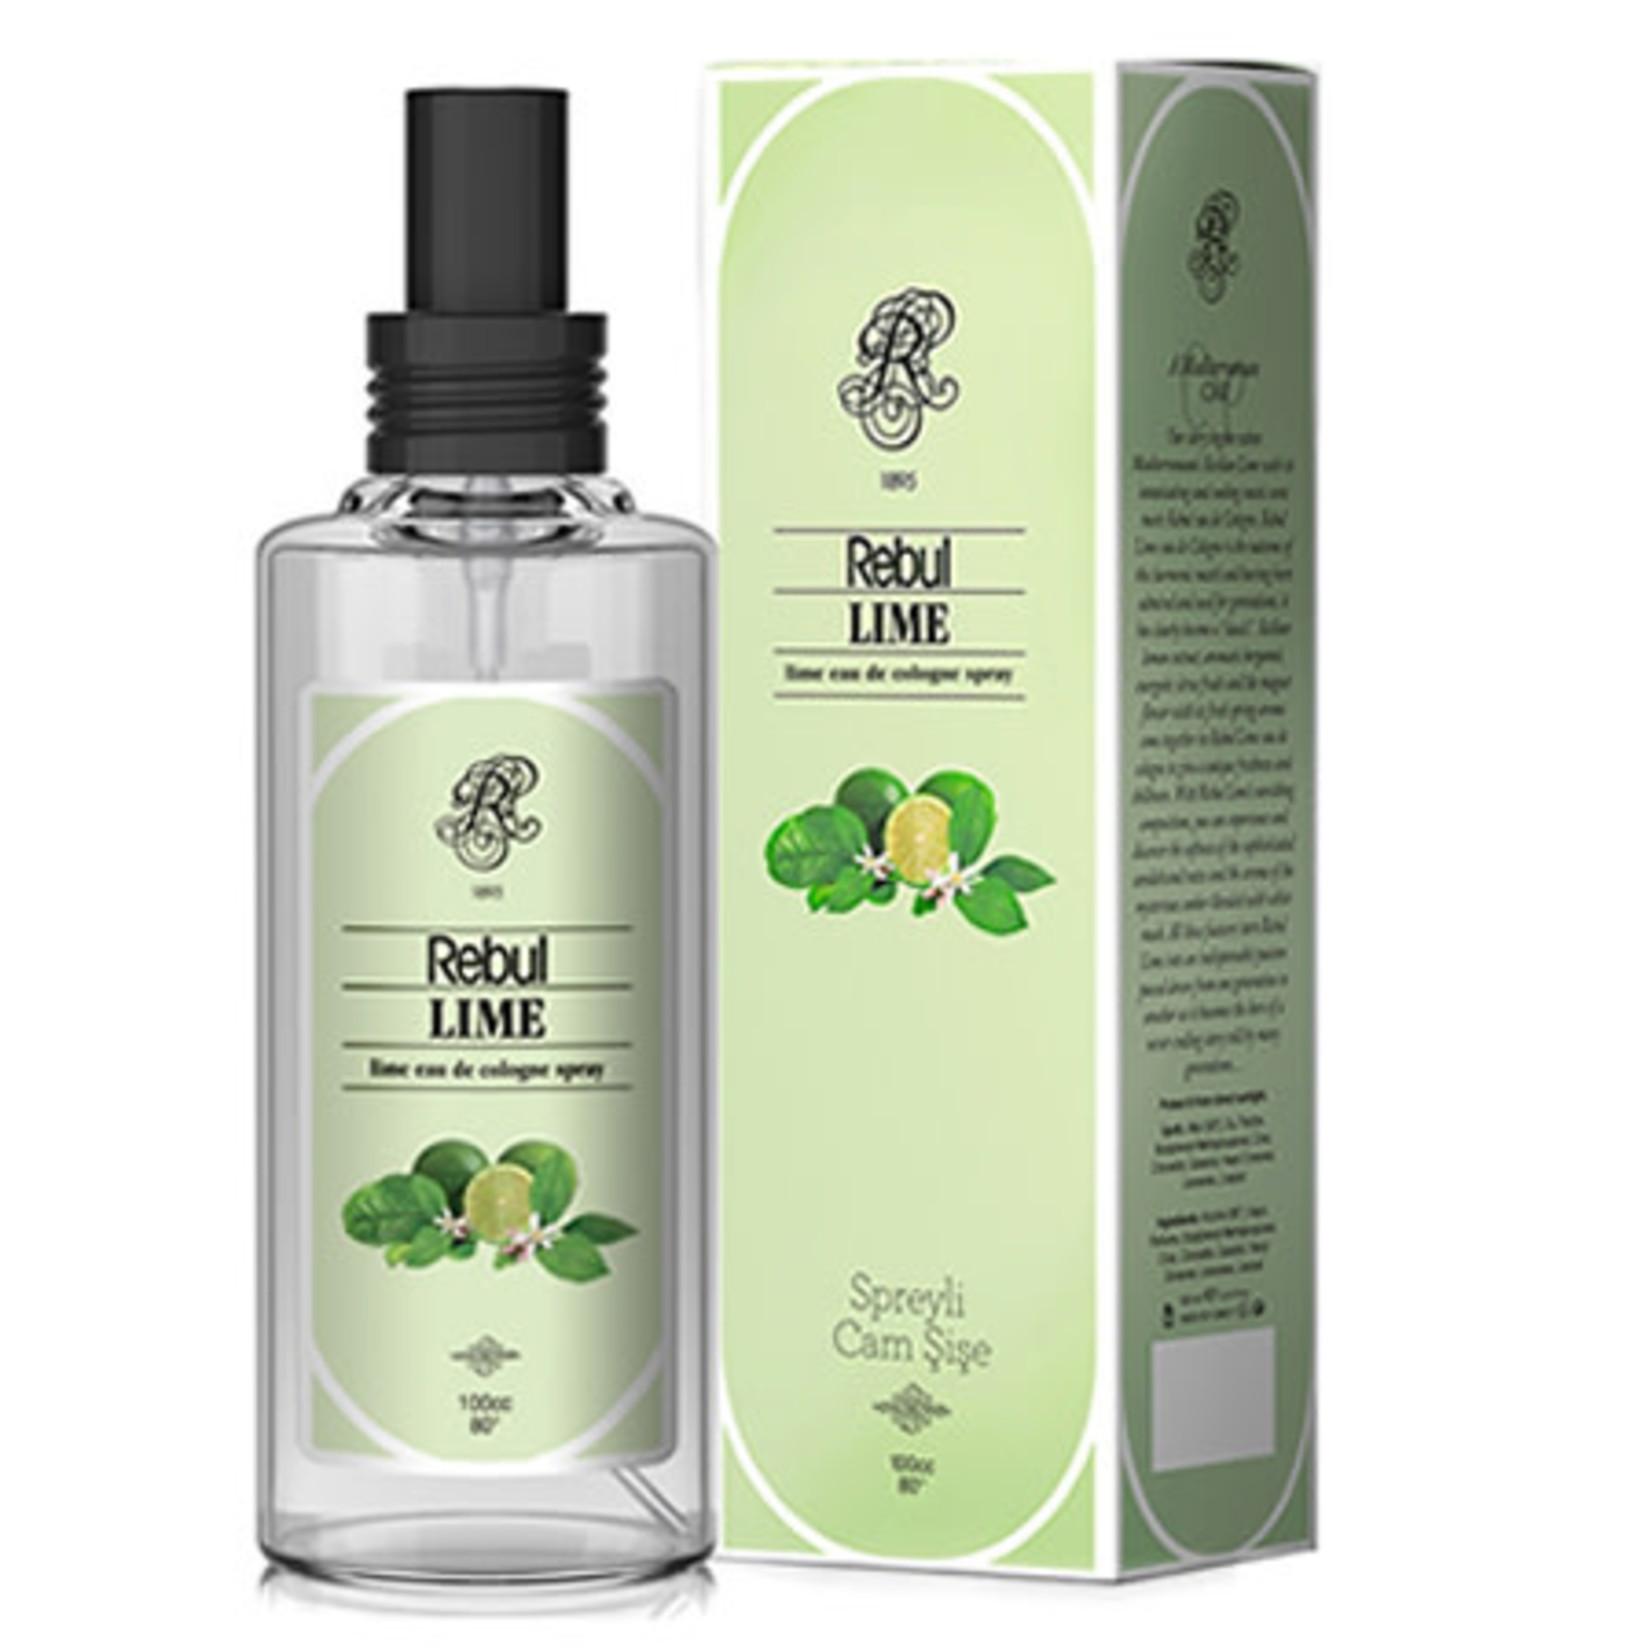 Rebul Lime Hand Sanitizer - 100 ml